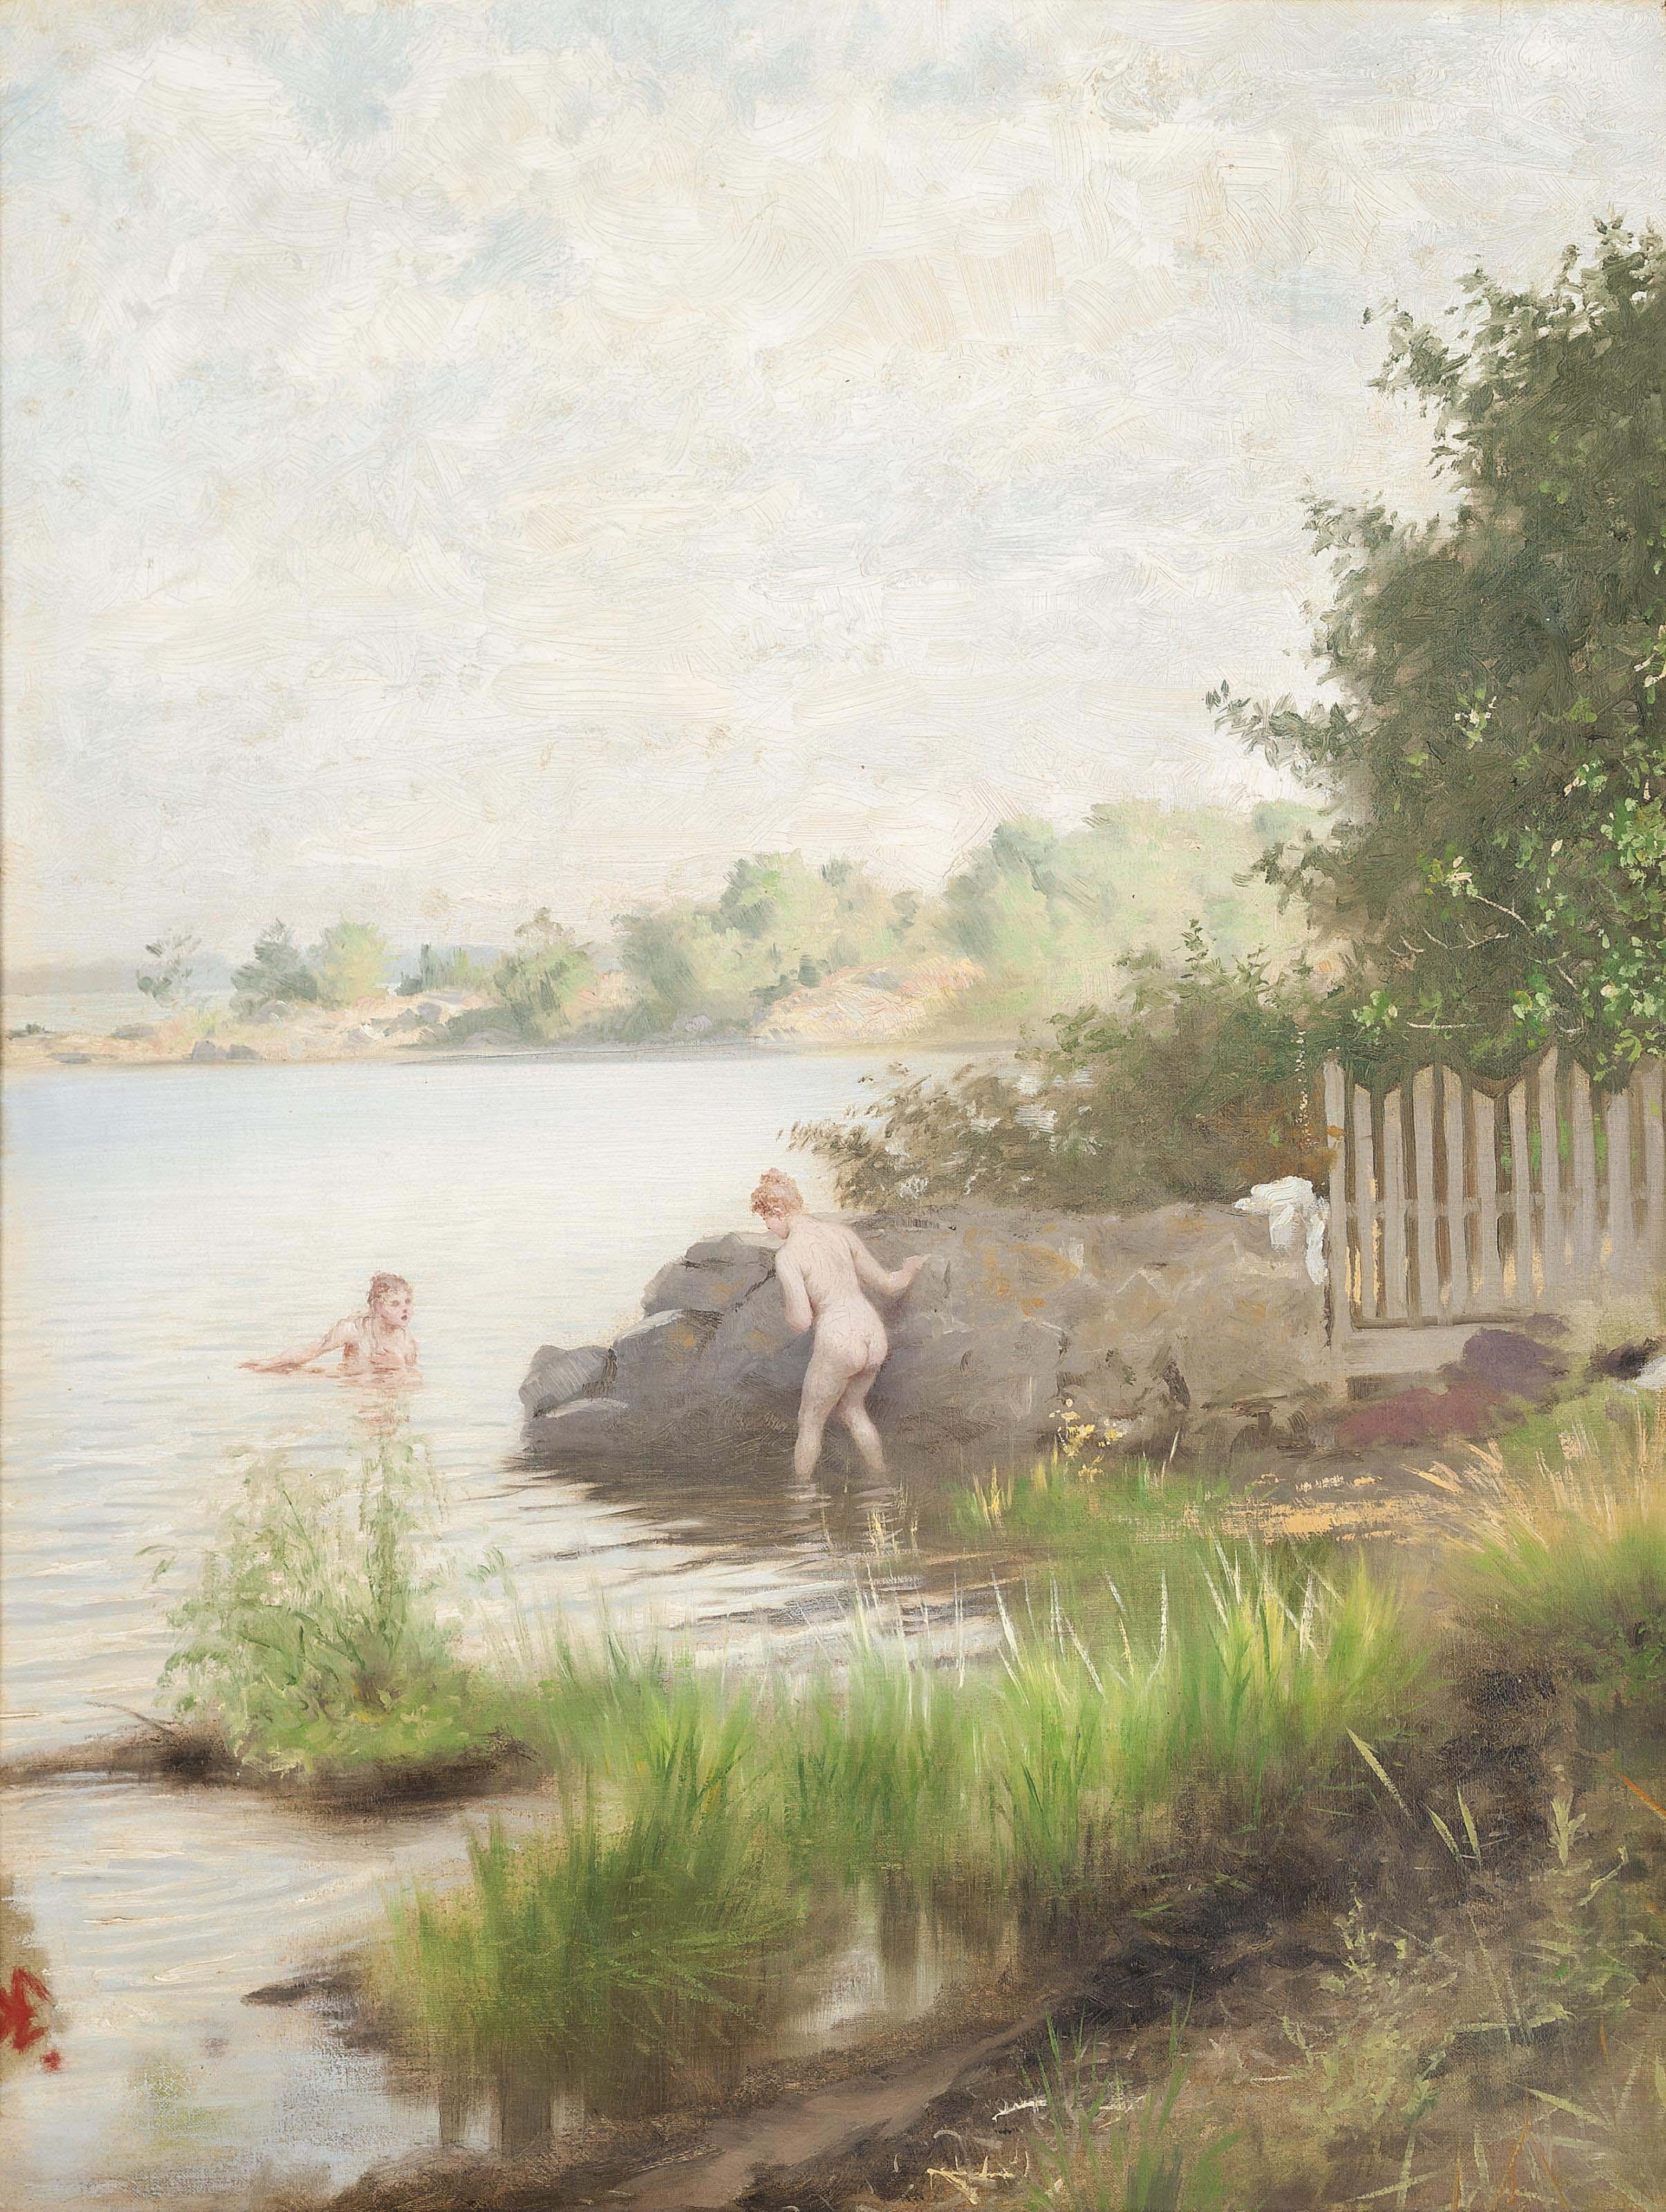 Knut Ekwall (Swedish, 1843-191